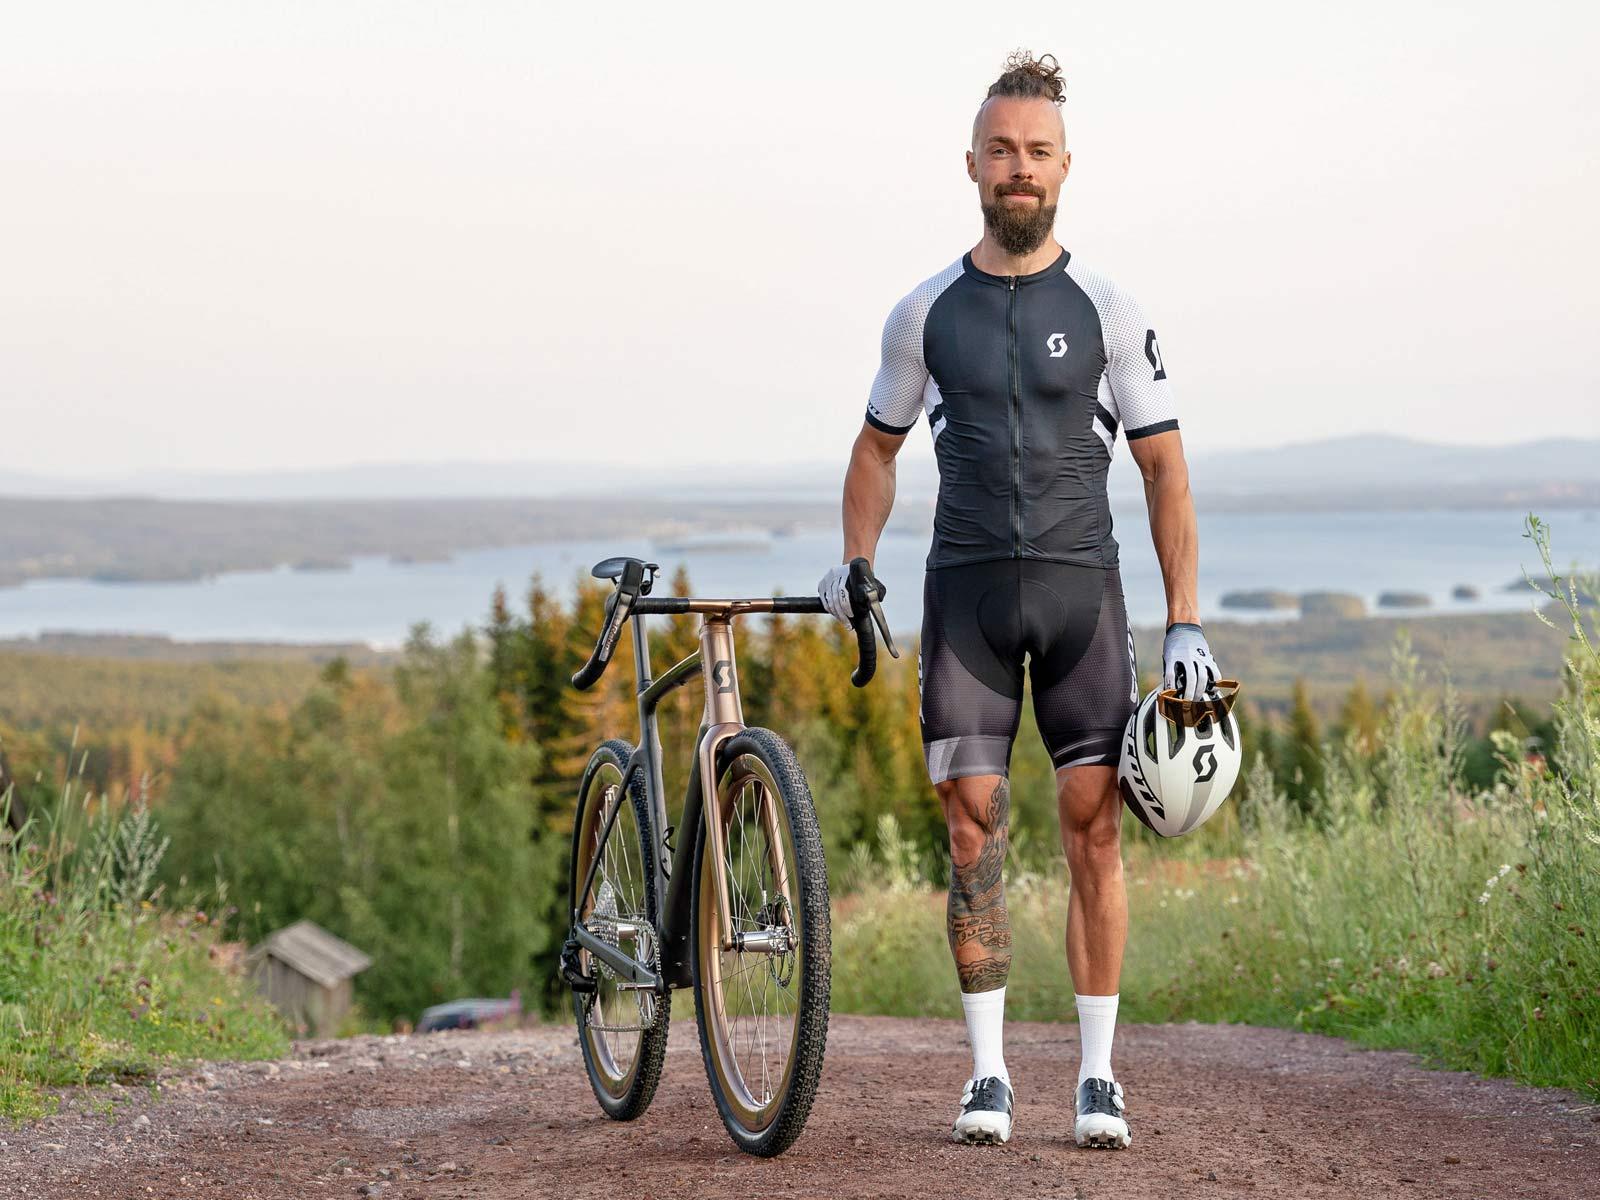 custom Scott Addict Gravel Tuned Dangerholm edition lightweight carbon prototype gravel bike project,Gustav